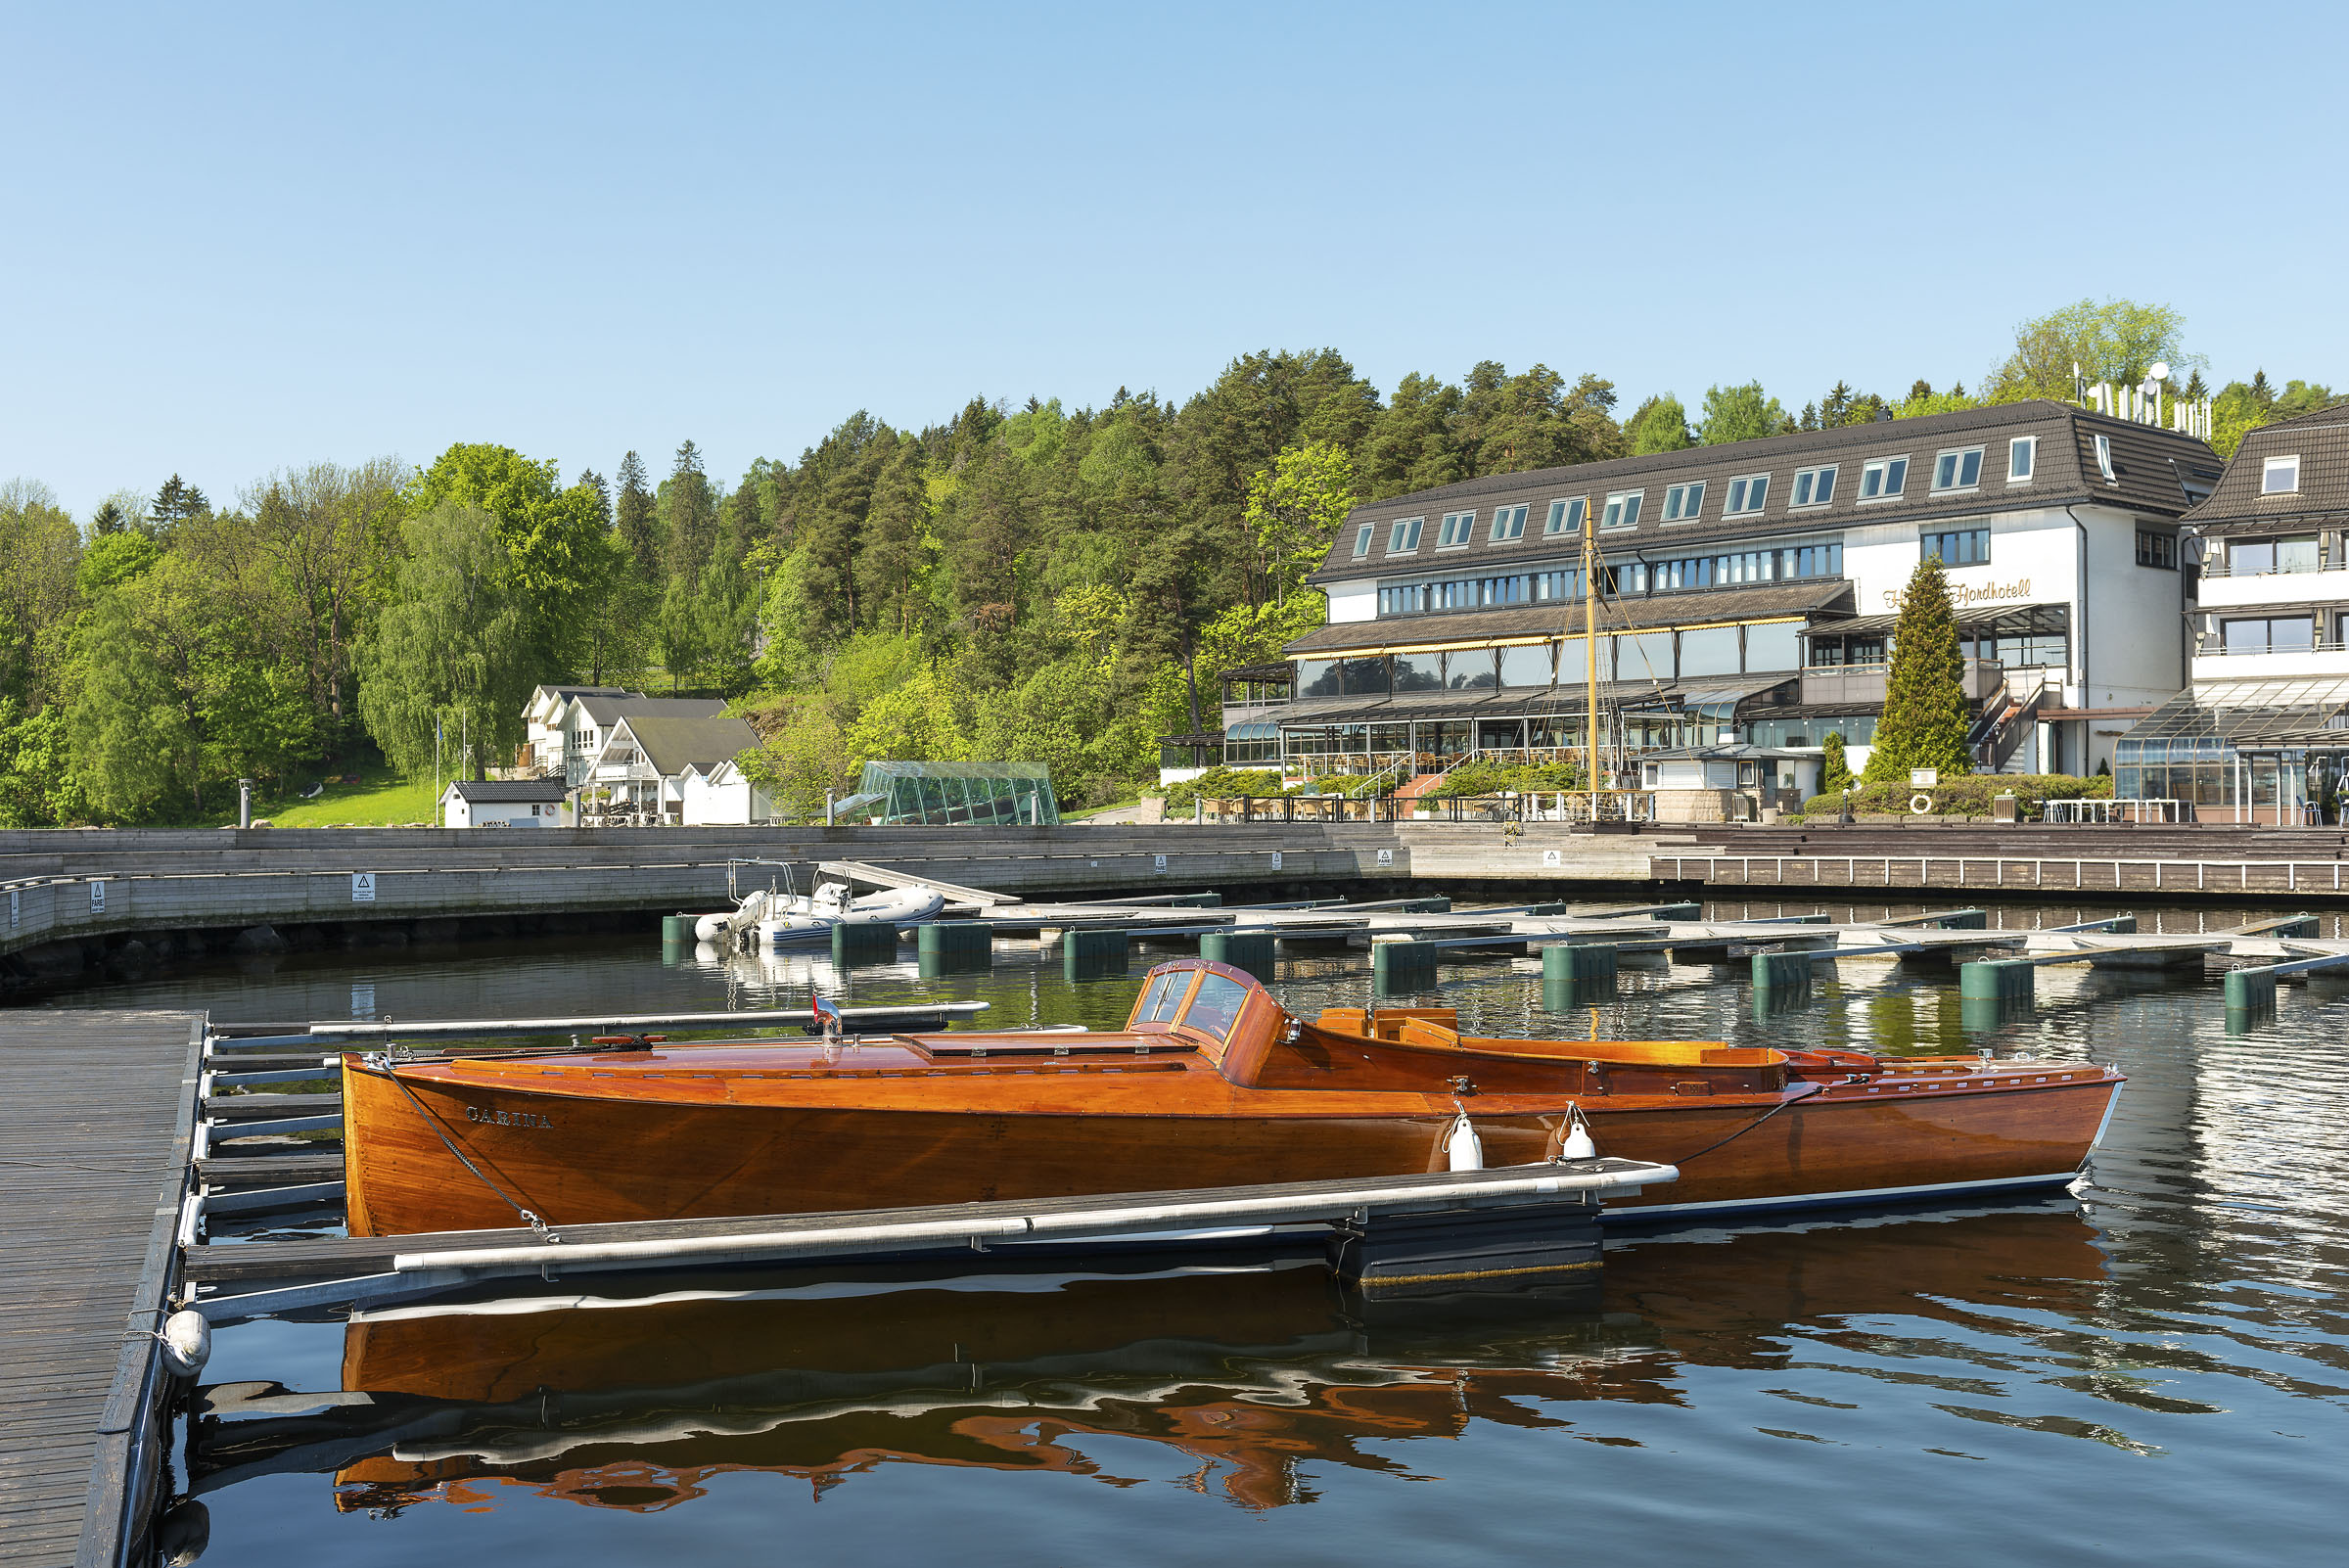 Holmen_Fjordhotell_Carina_1.jpg